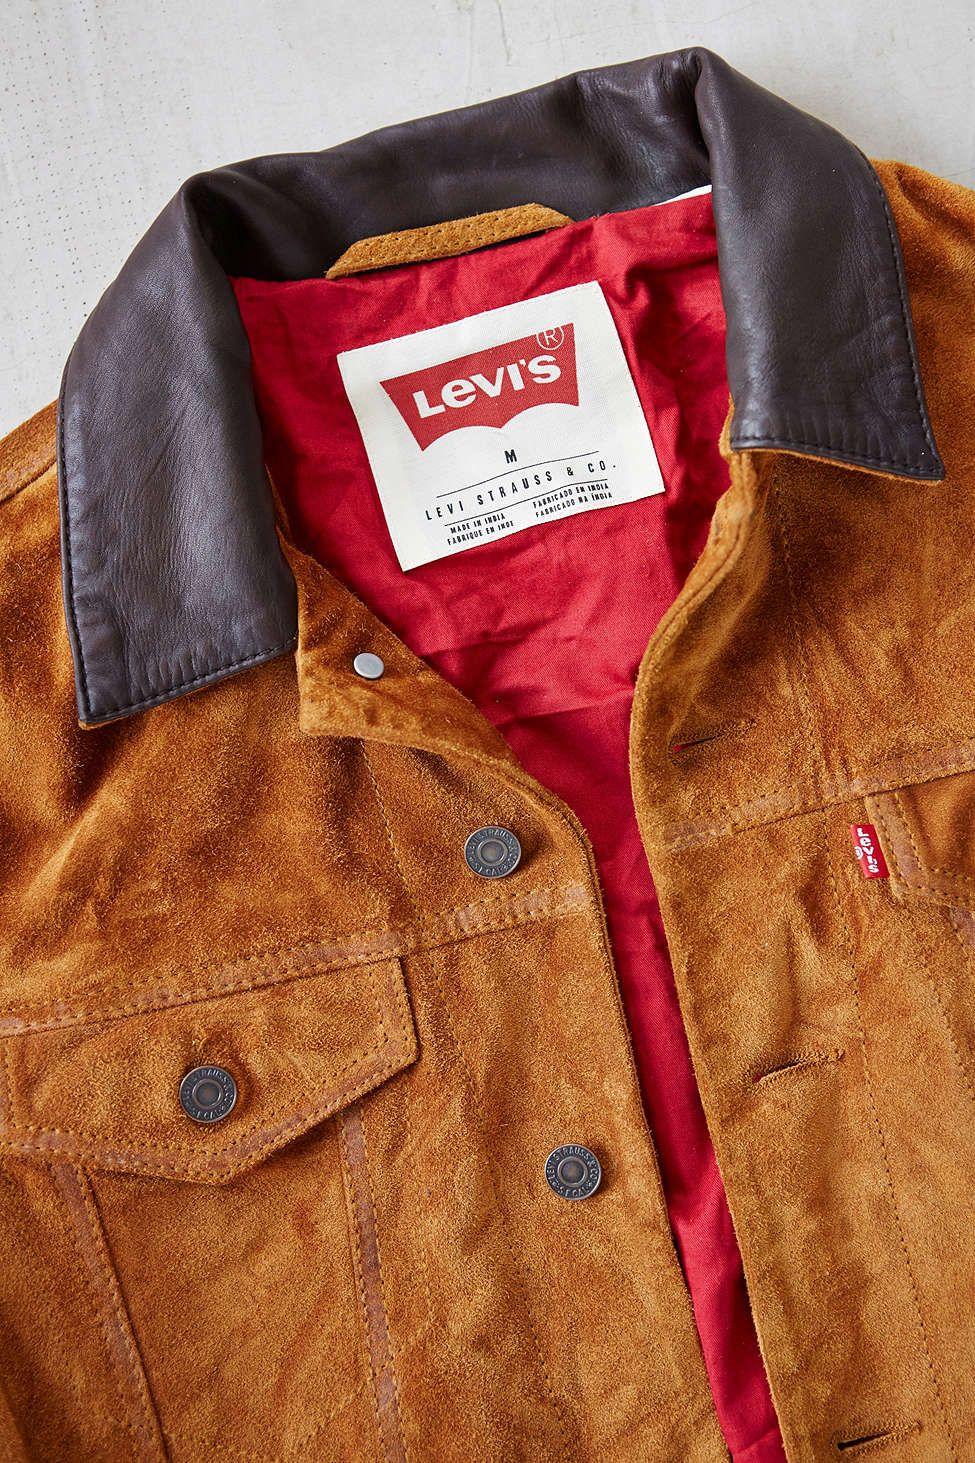 be6ffafc Levi's Suede Trucker Jacket | Dapper | Jackets, Suede jacket, Urban ...